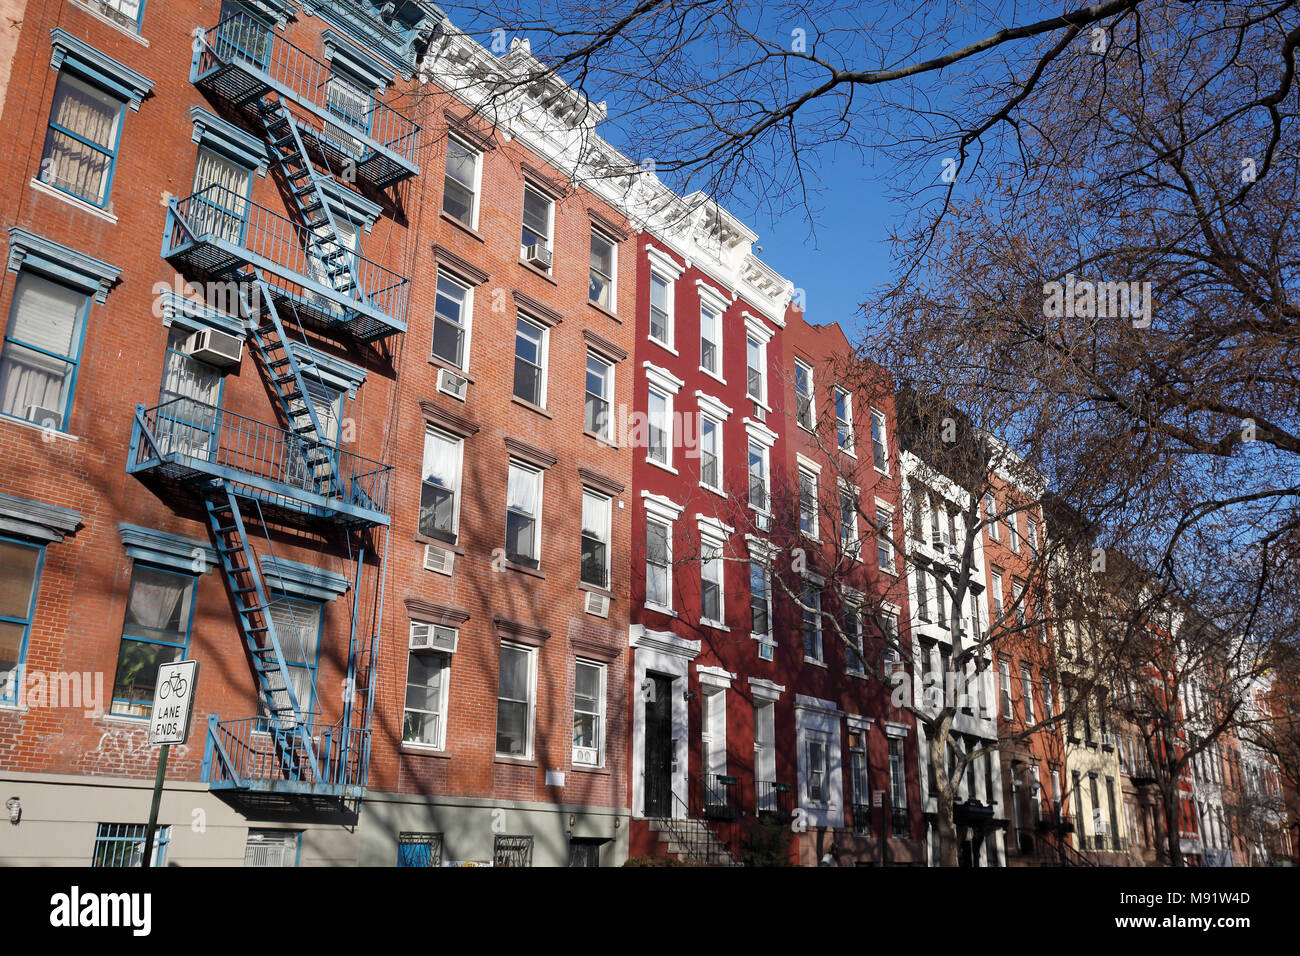 East Village New York City Imágenes De Stock & East Village New York ...